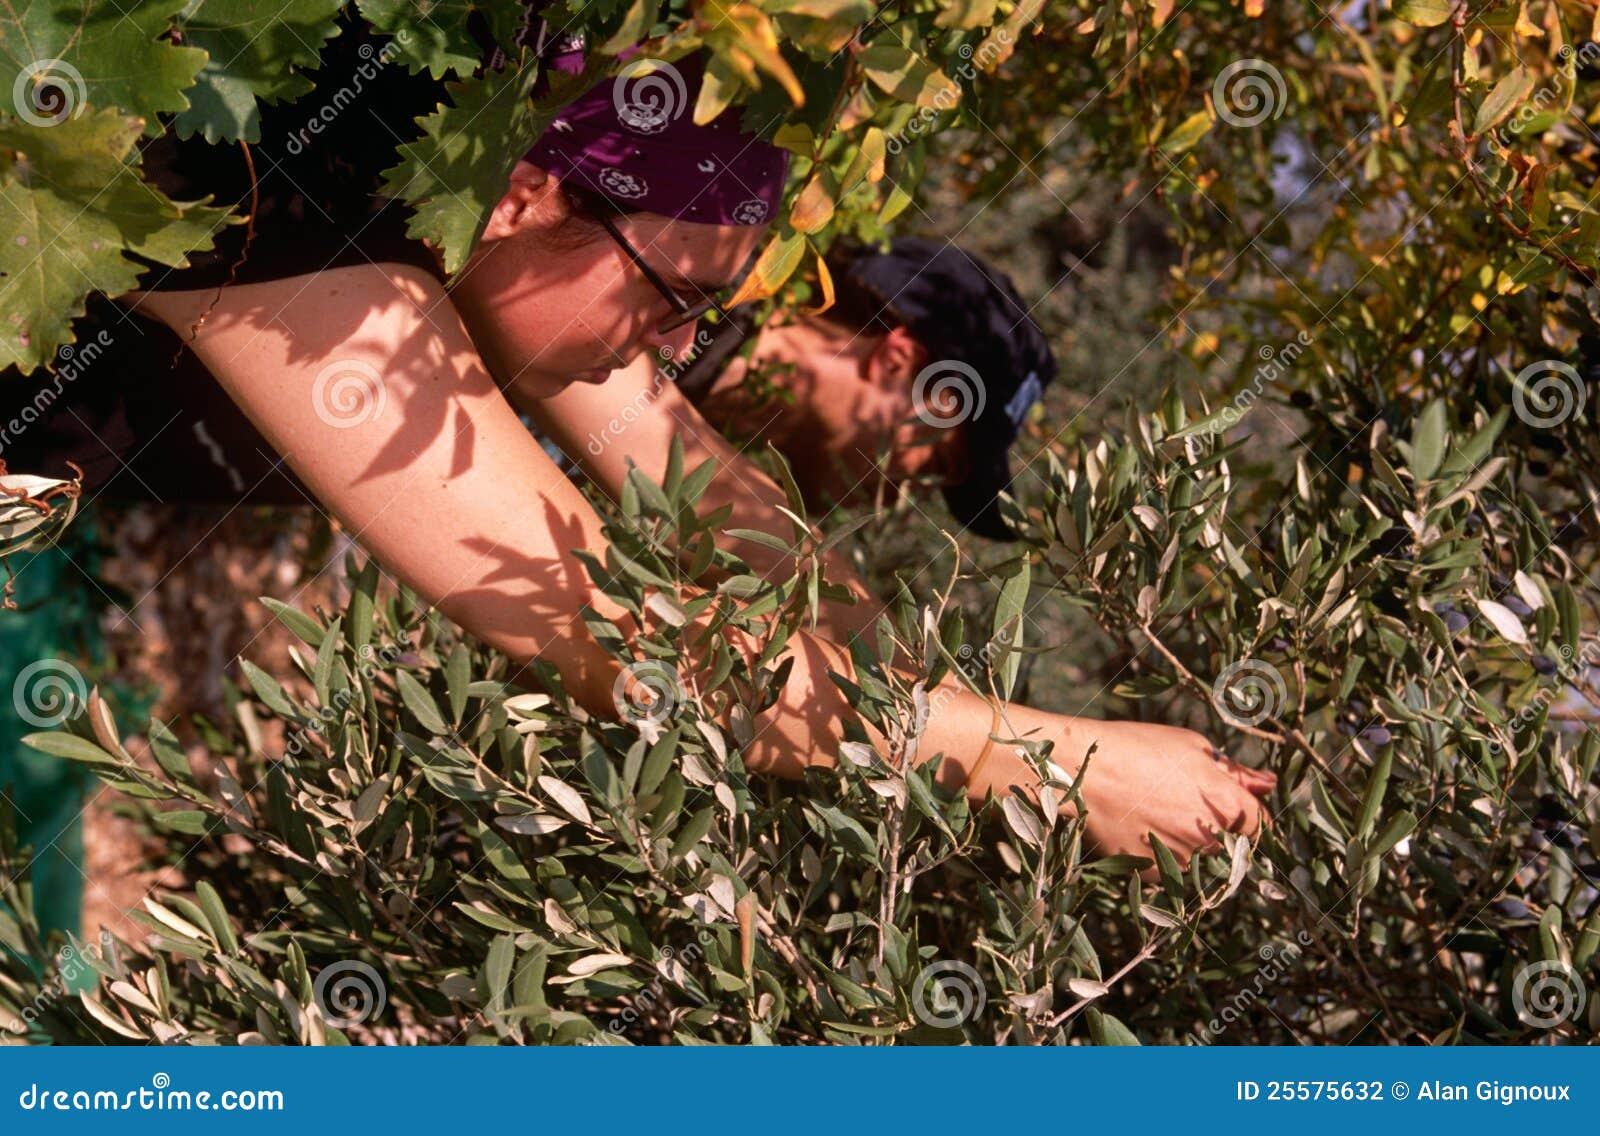 ISM volunteers in an olive grove, Palestine